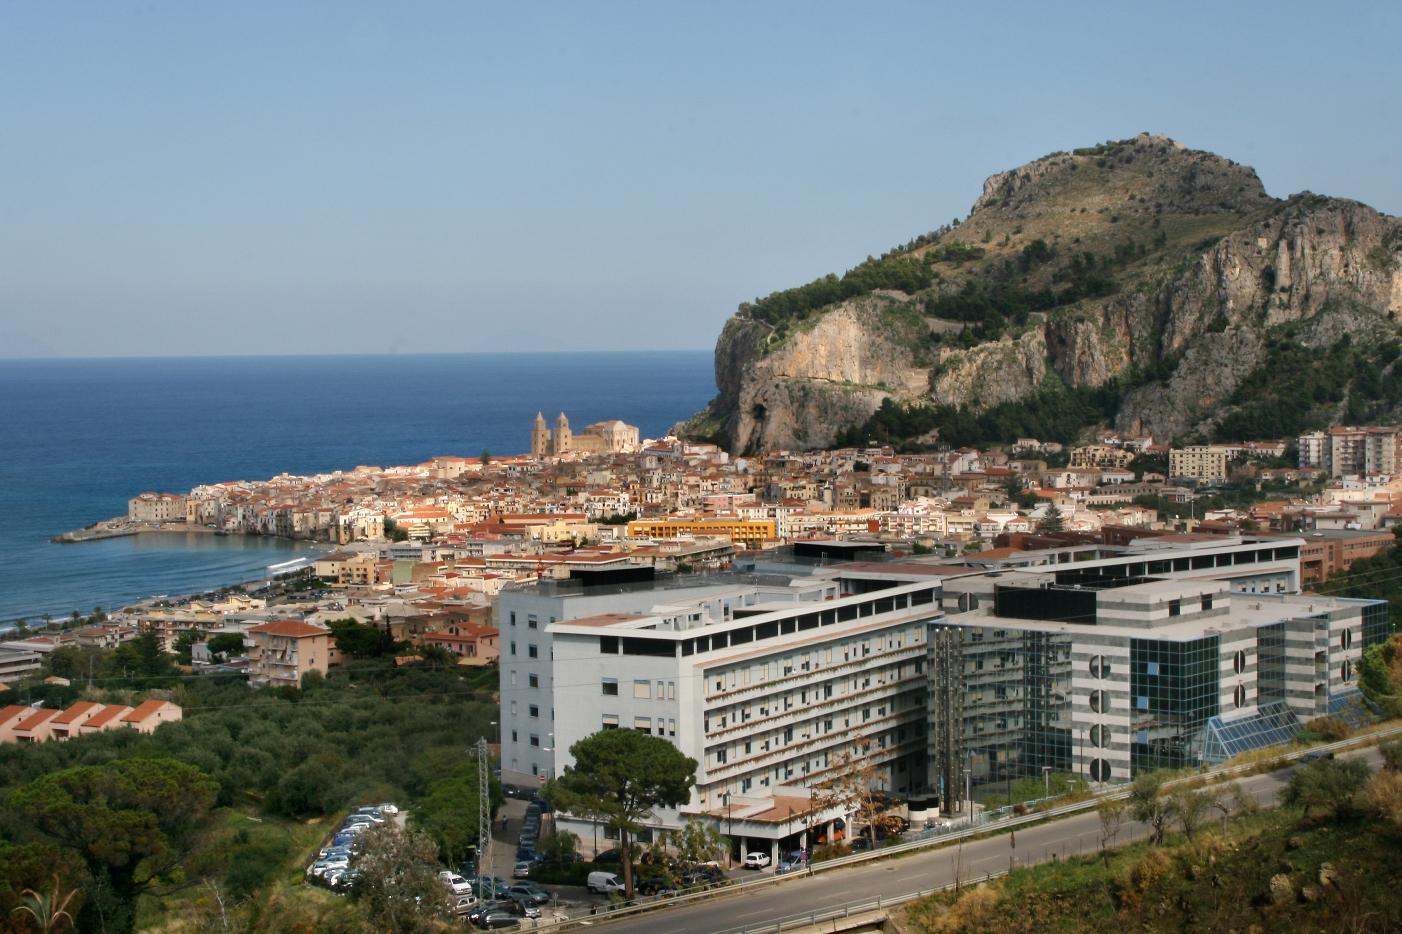 ospedale Giglio Cefalù